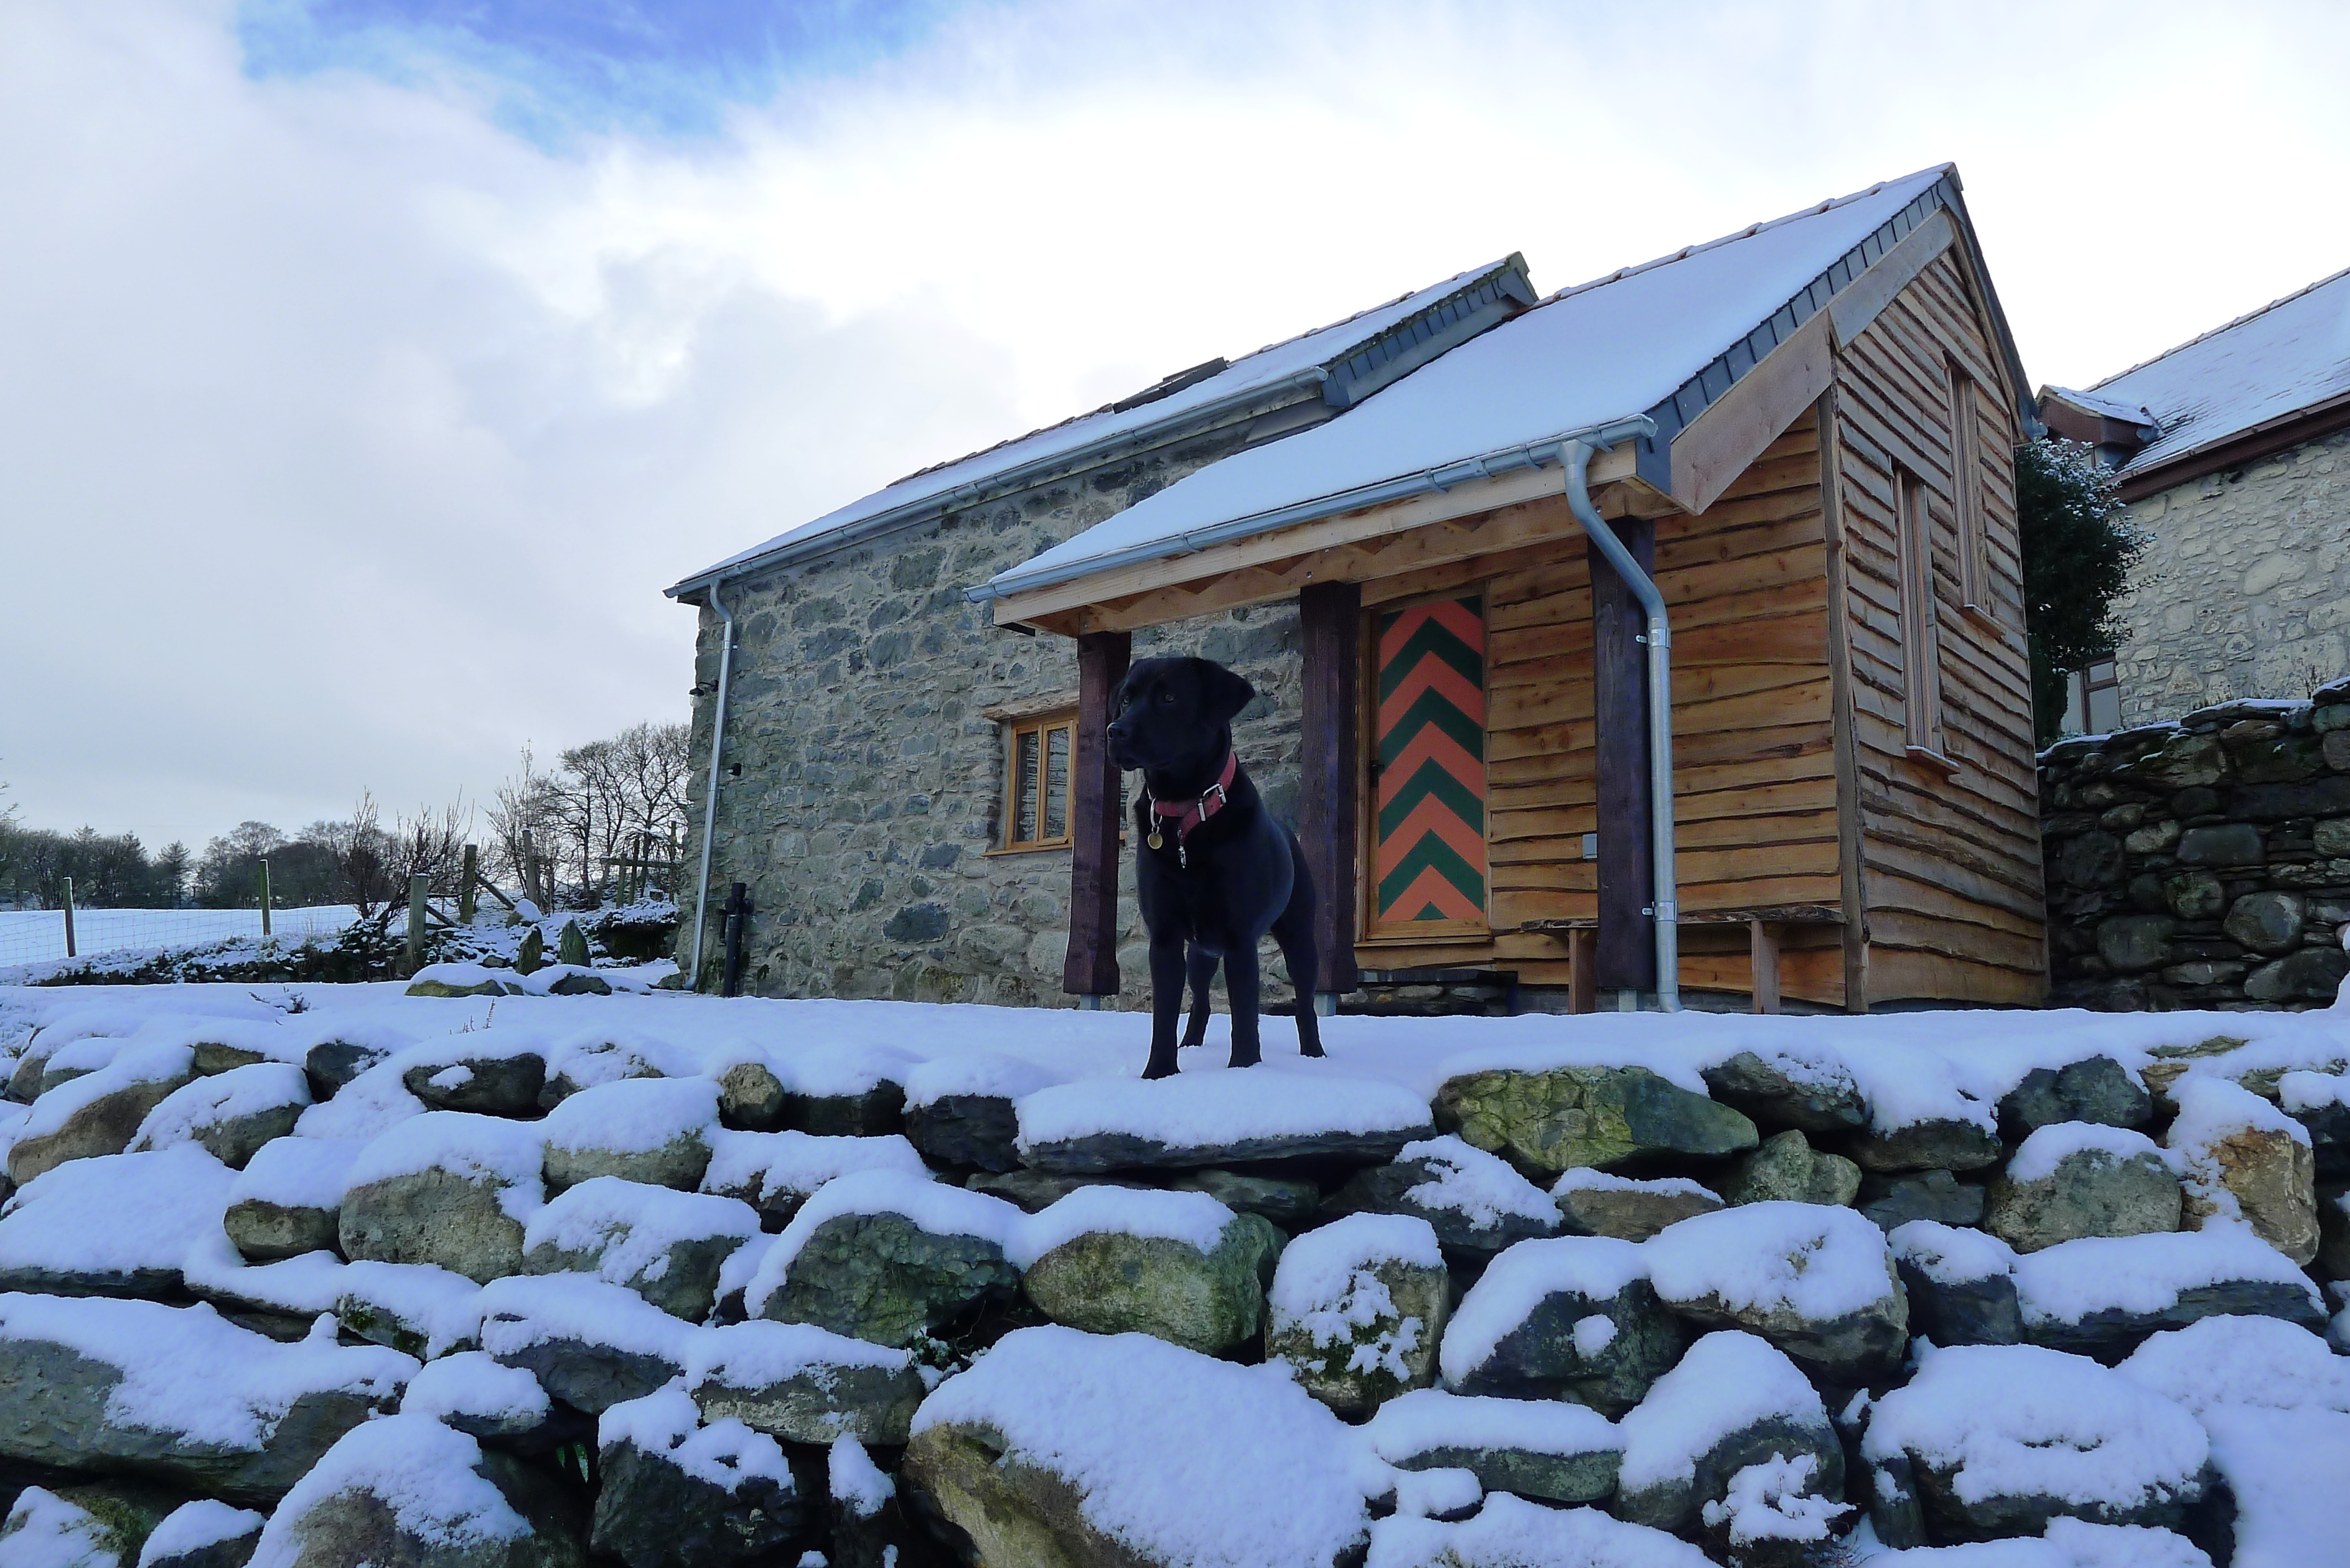 North Wales Holiday Accommodation